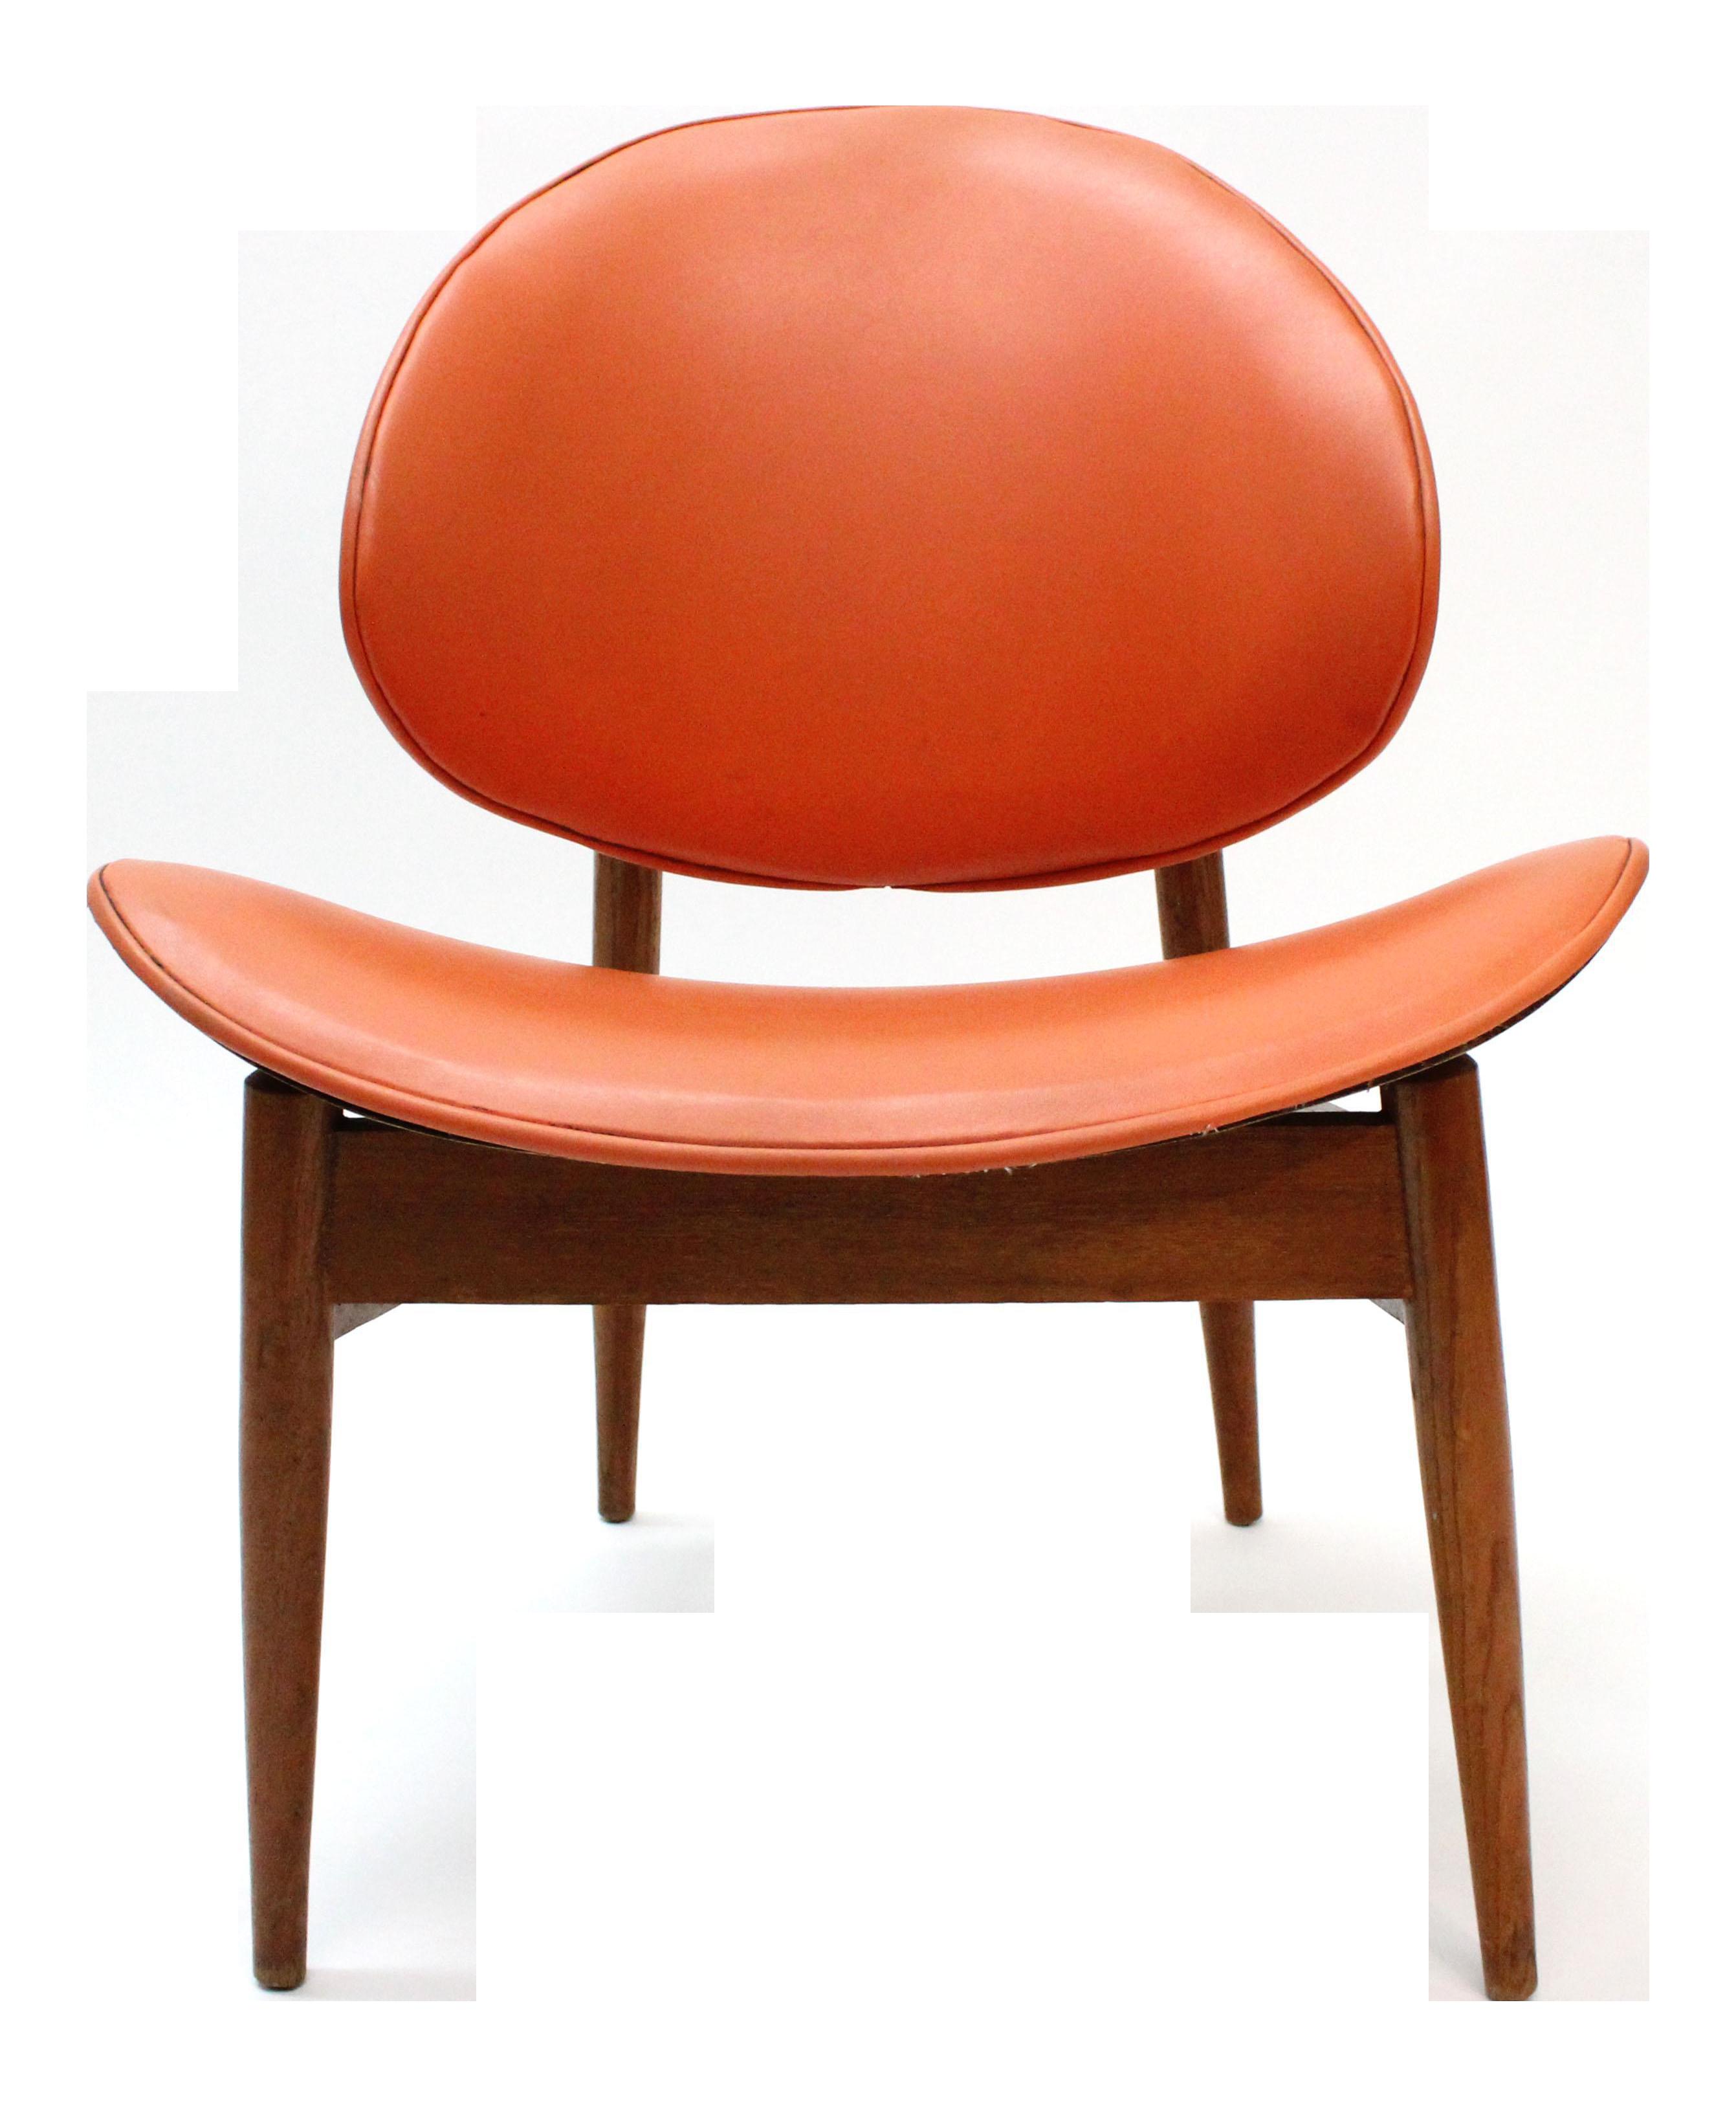 Charming Vintage Seymour James Wiener Kodawood Clam Shell Chair